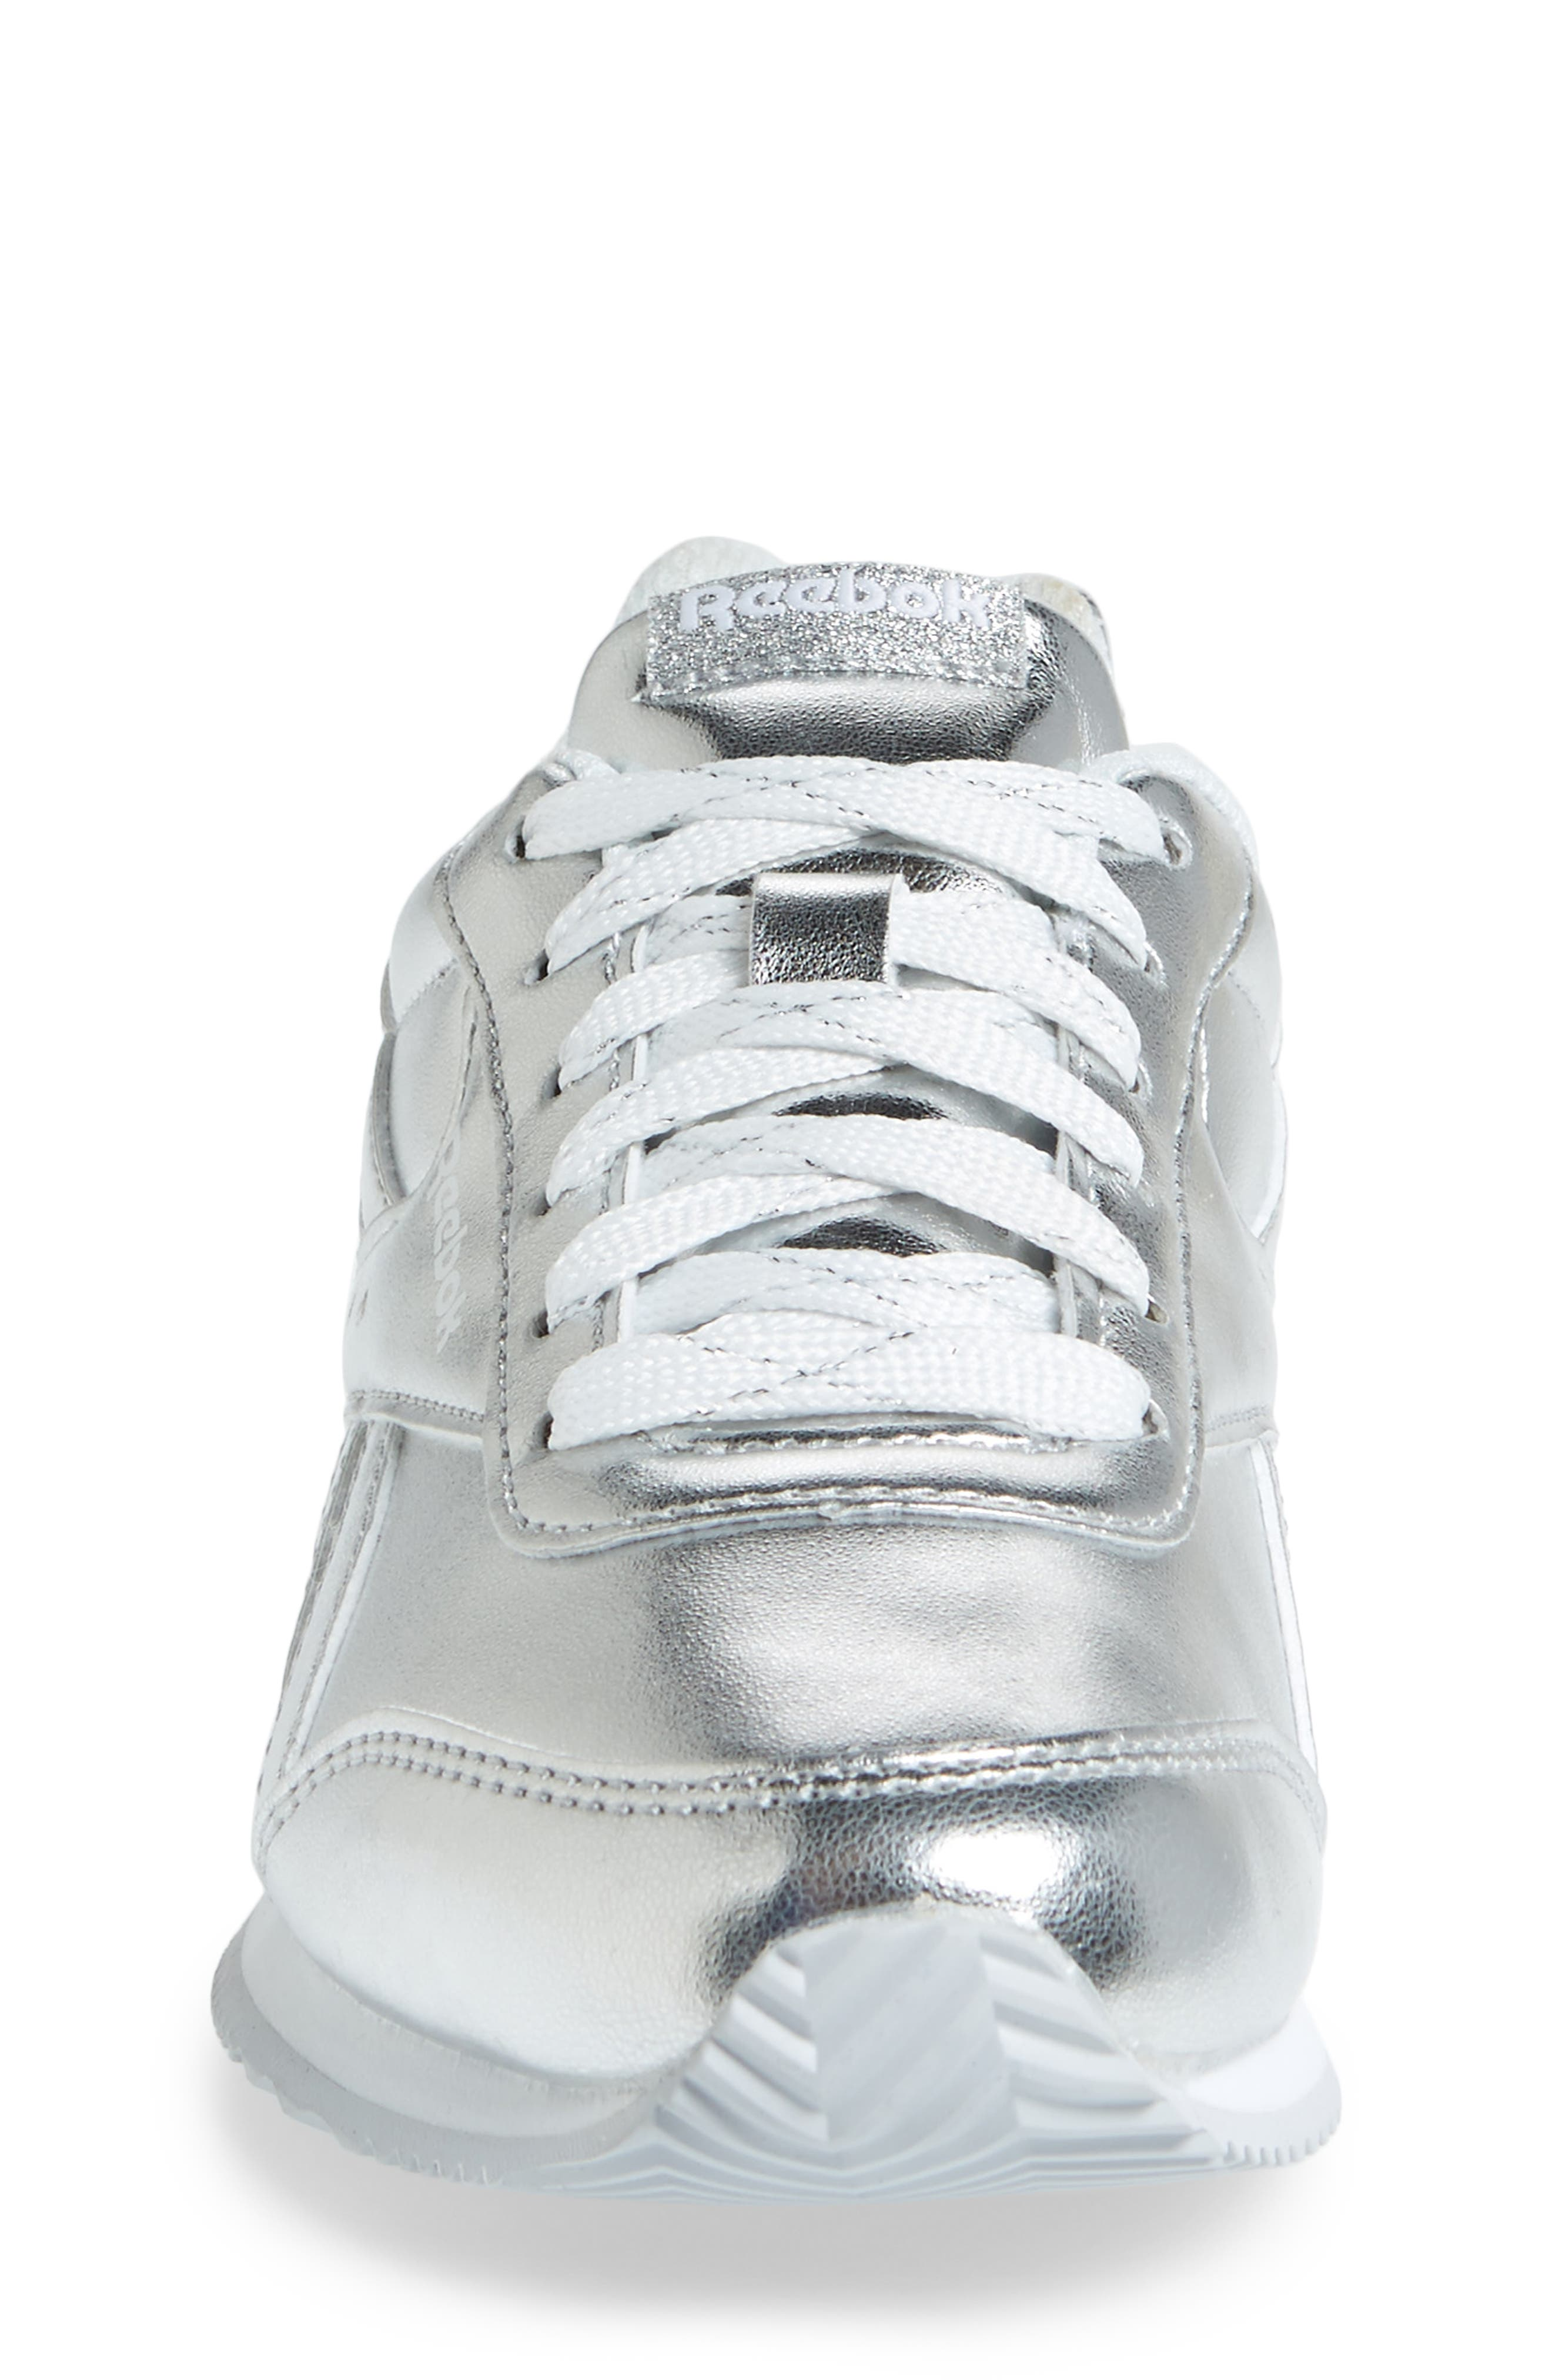 Royal Classic Jogger 2.0 Sneaker,                             Alternate thumbnail 4, color,                             040